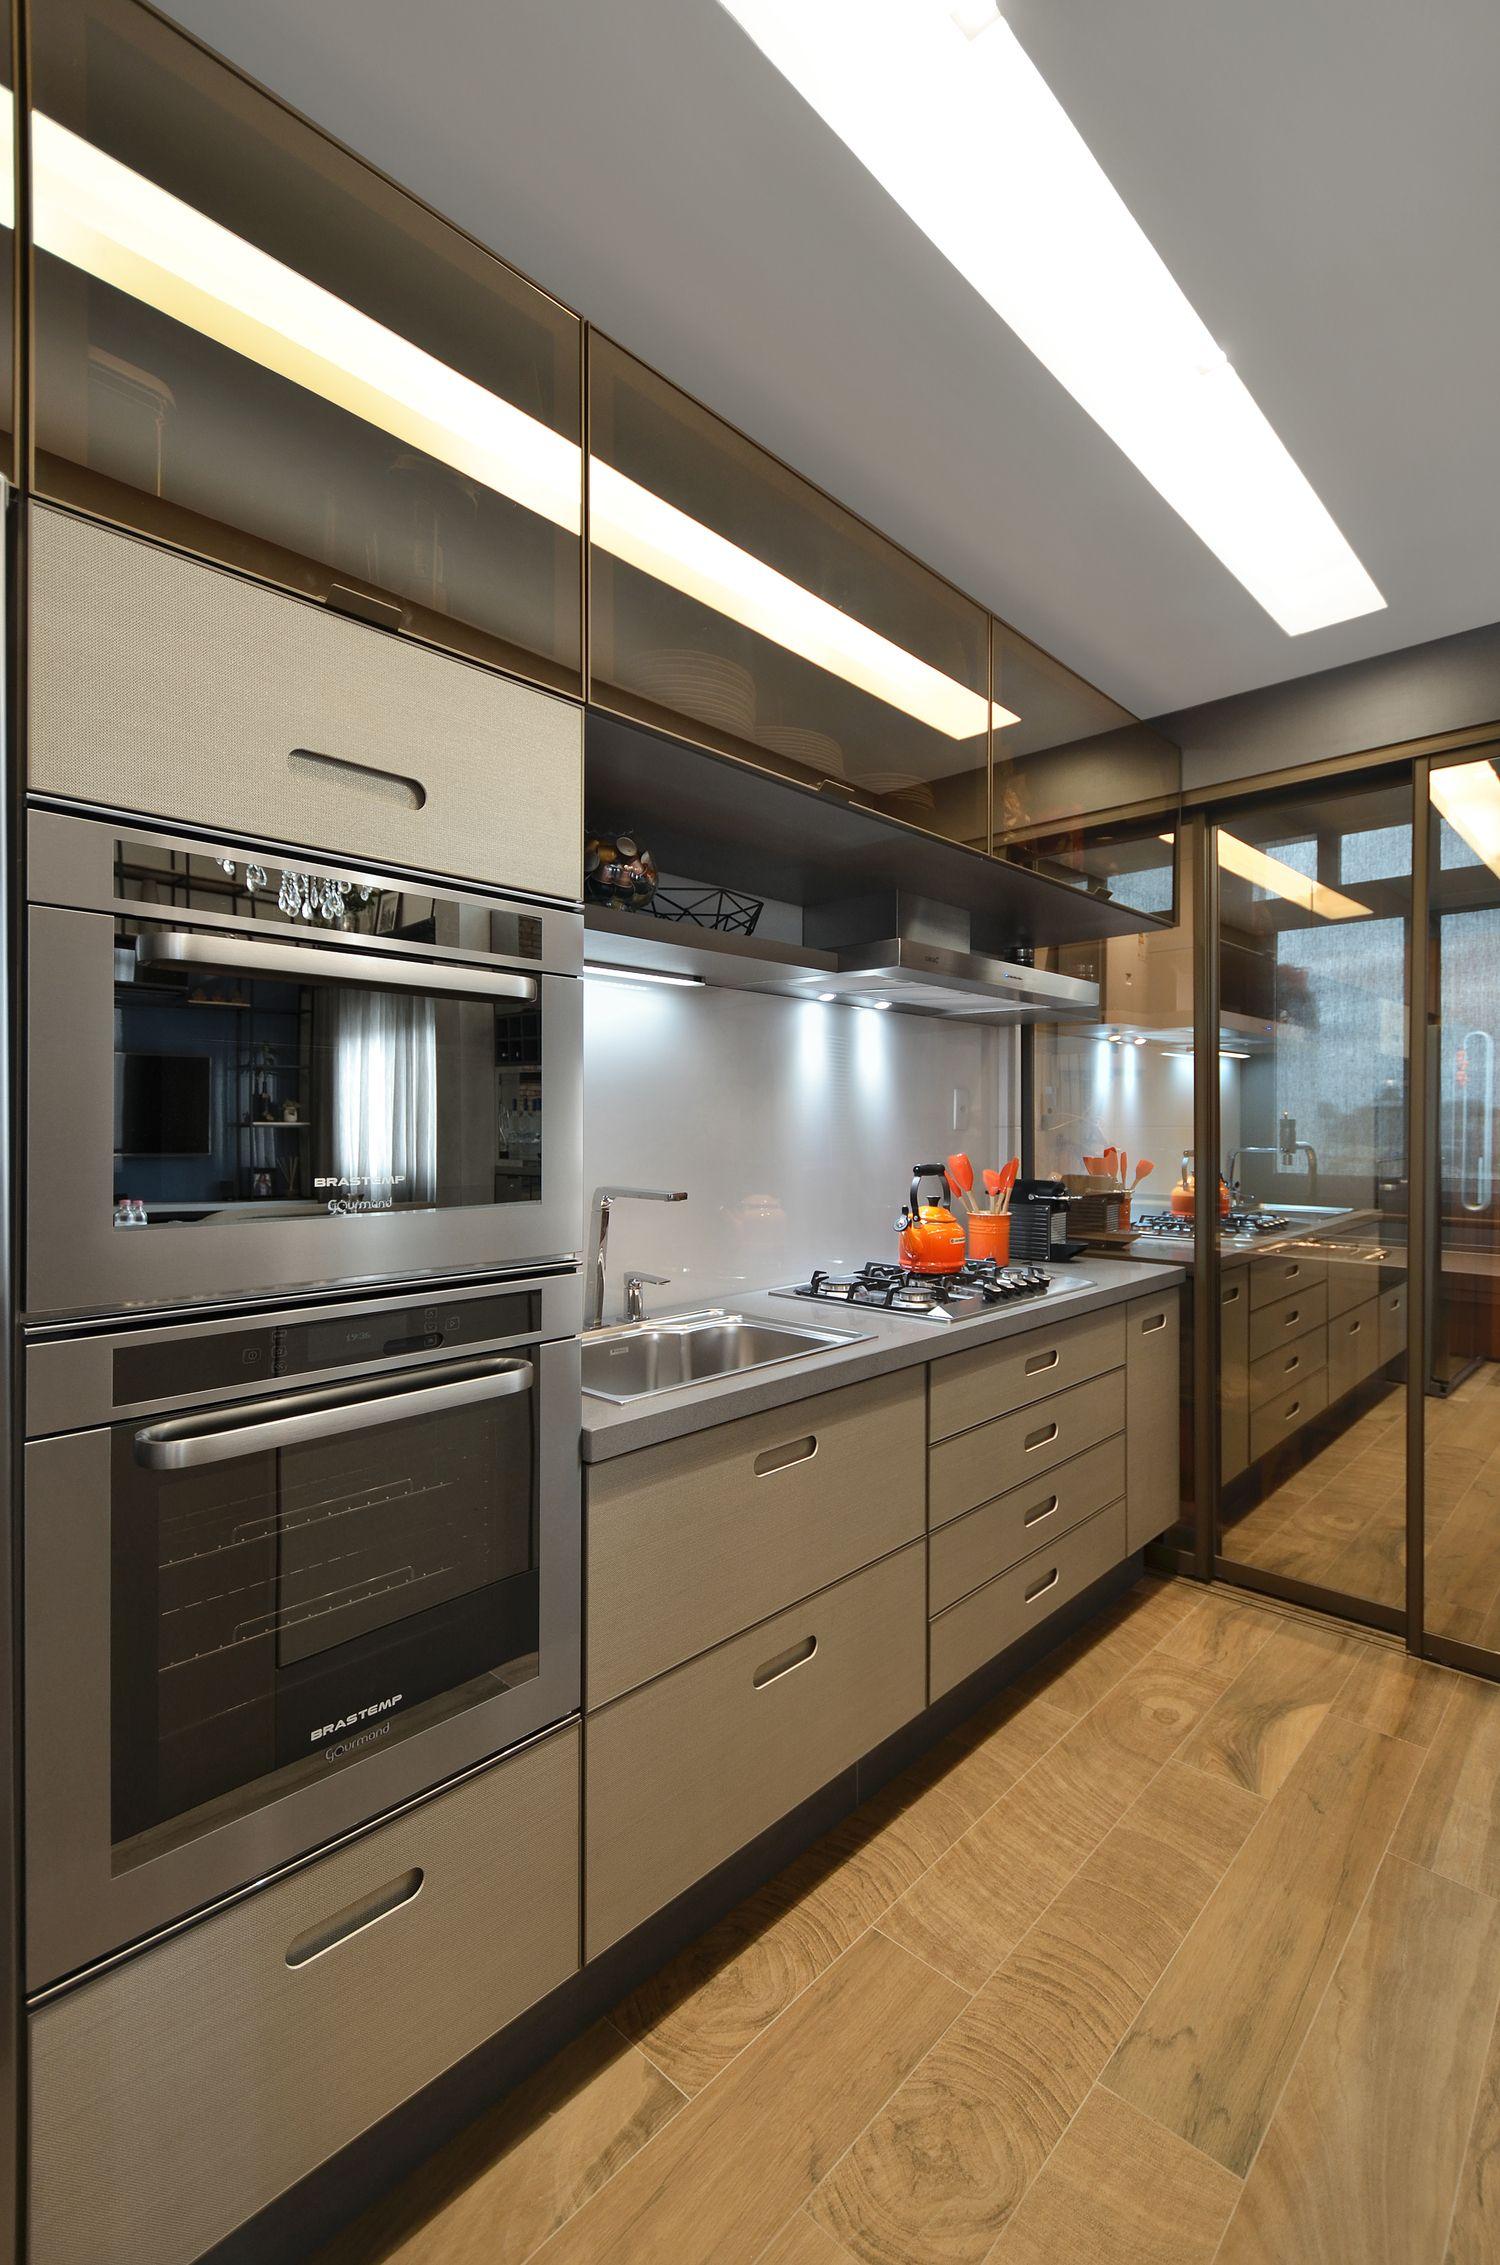 Loft T Cozinha Servi Os Cozinha Pinterest Loft Cozinha E